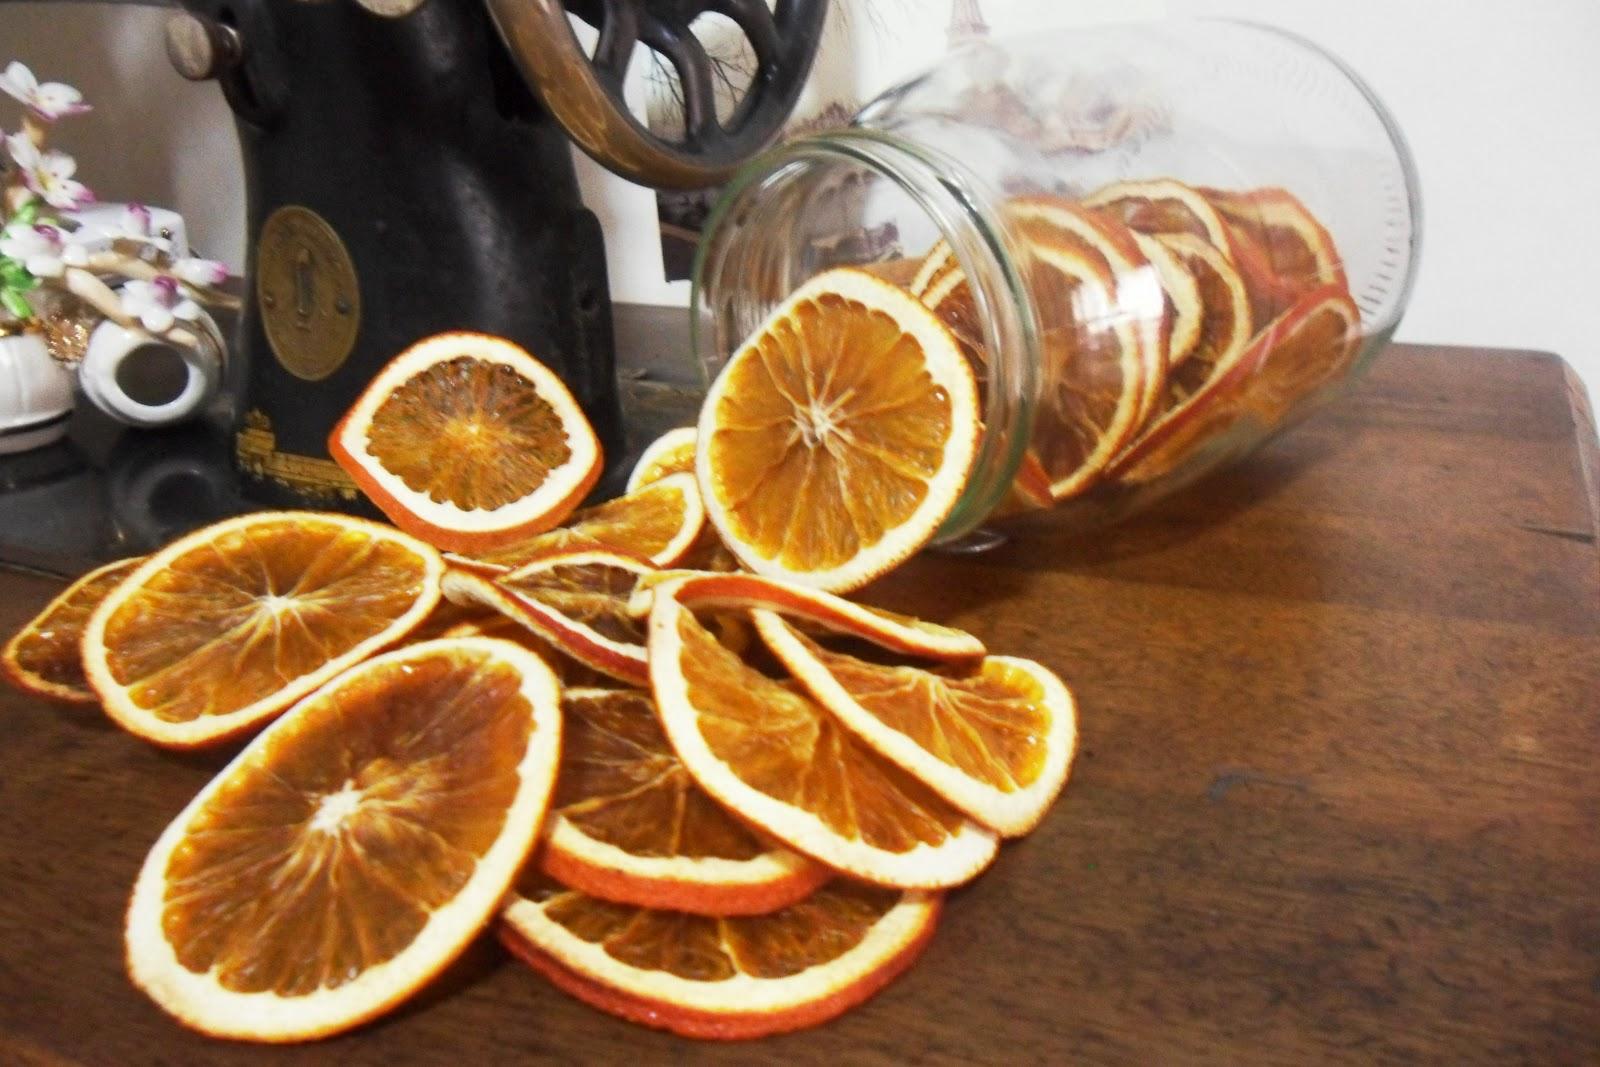 Cuoriefiori come essiccare le arance for Arance essiccate decorazioni